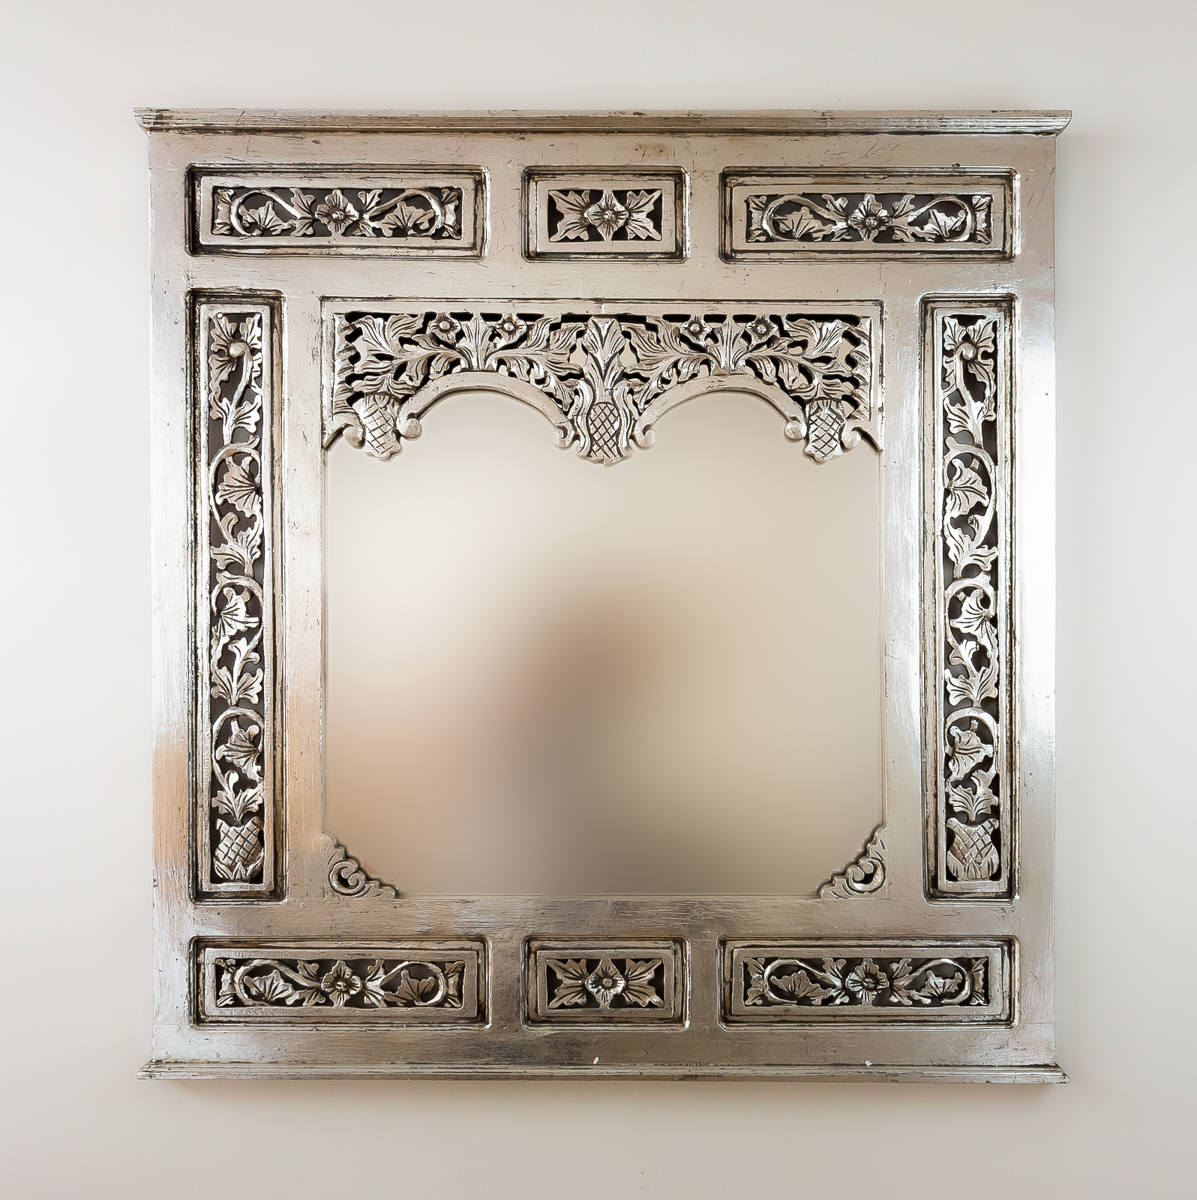 Espejo decorativo de pared en madera nanas teca plata for Espejo pared plata